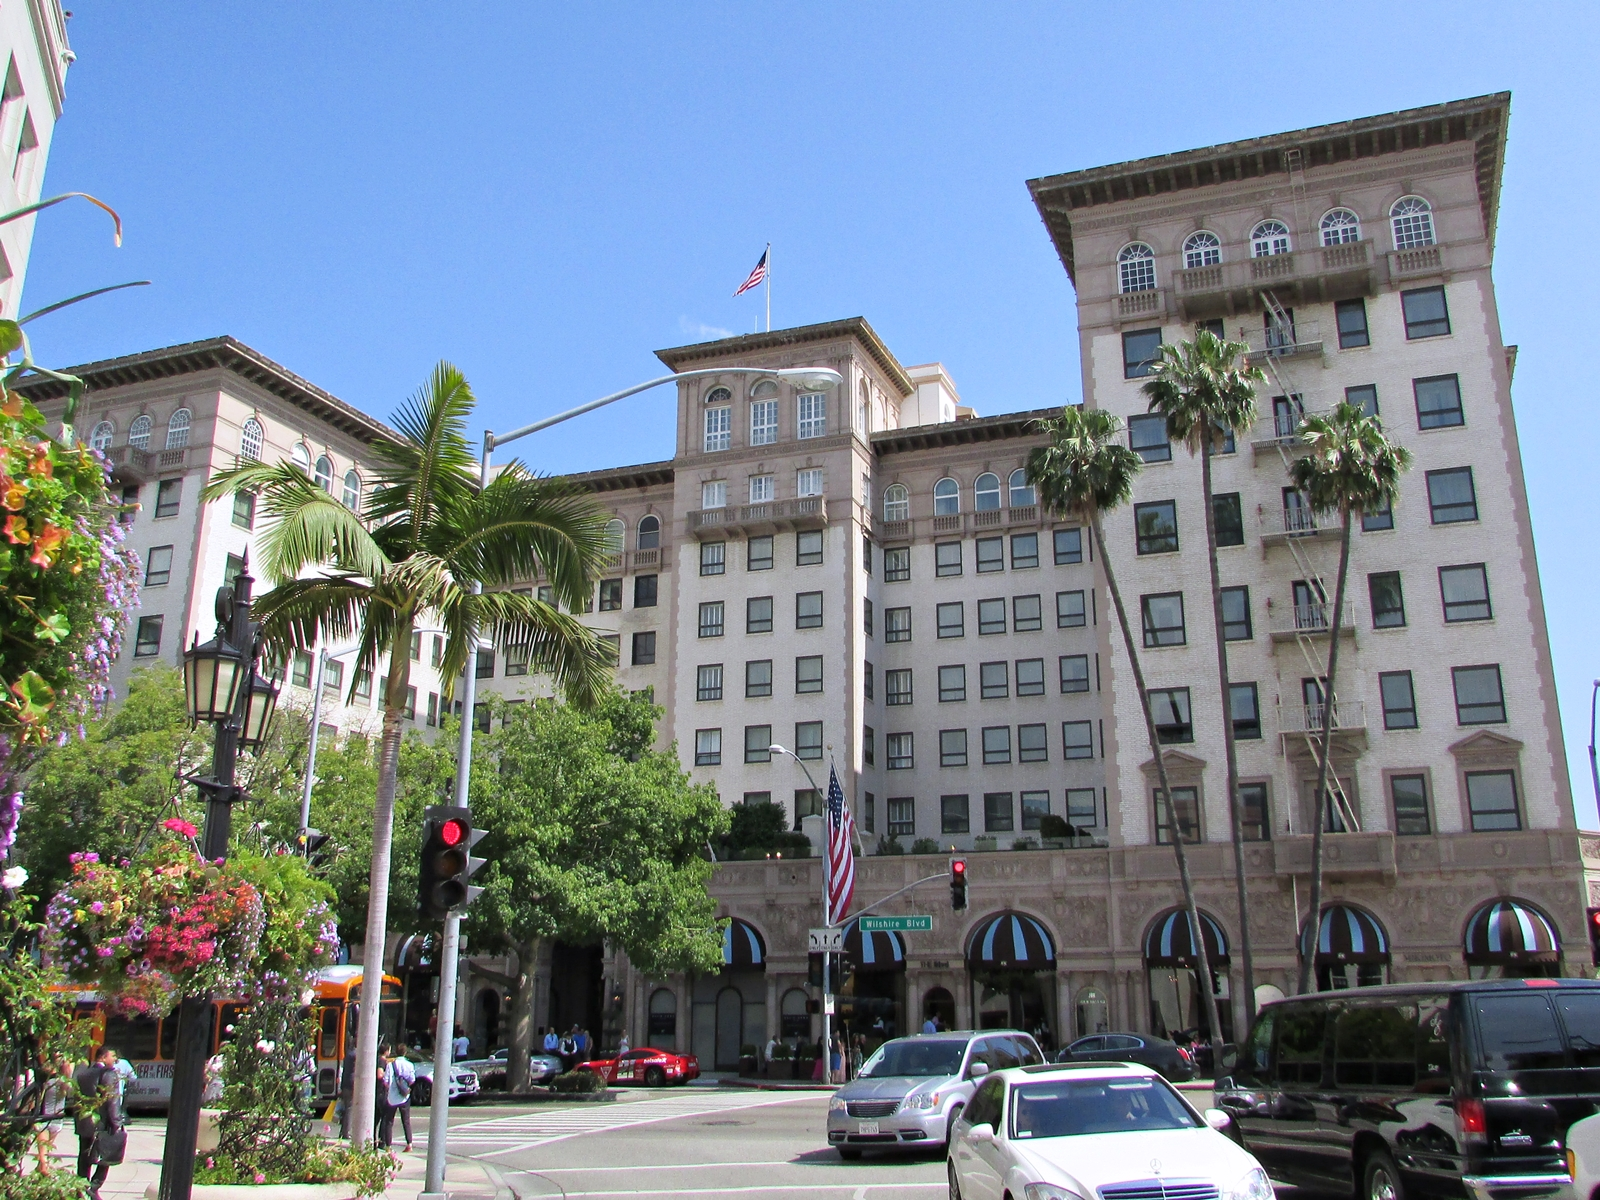 Rodeo Drive - The Beverly Hills Hotel - USA Rundreise - Amerika Roadtrip - Fashionladyloves by Tamara Wagner - Travelblog